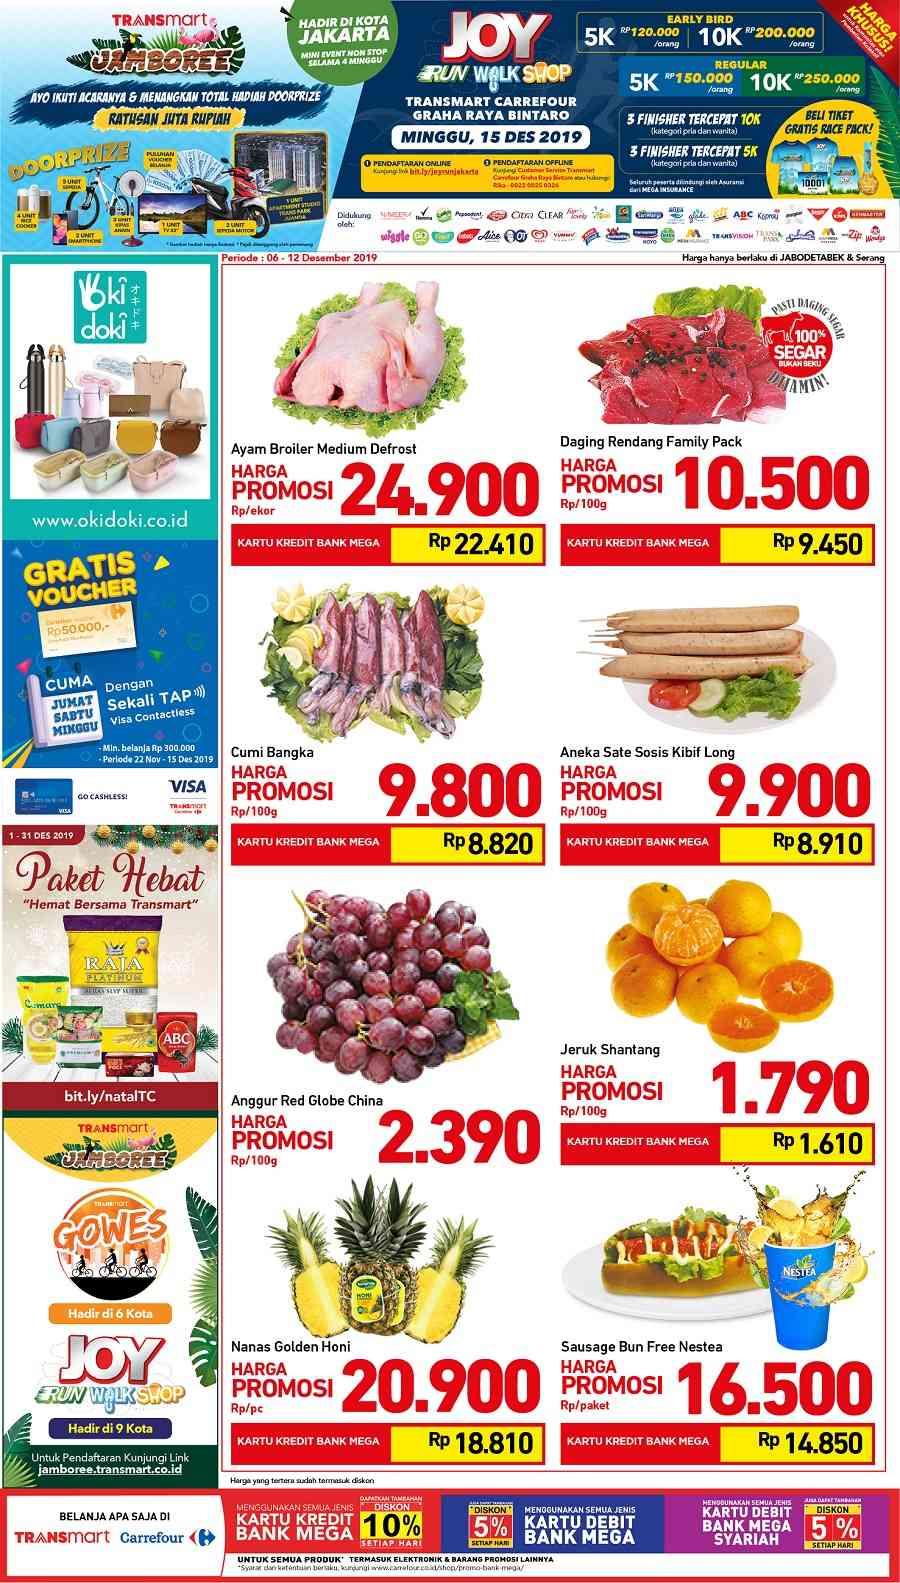 Promo Carrefour Katalog Promo Hebat Sepekan Fresh Periode 6-12 Desember 2019